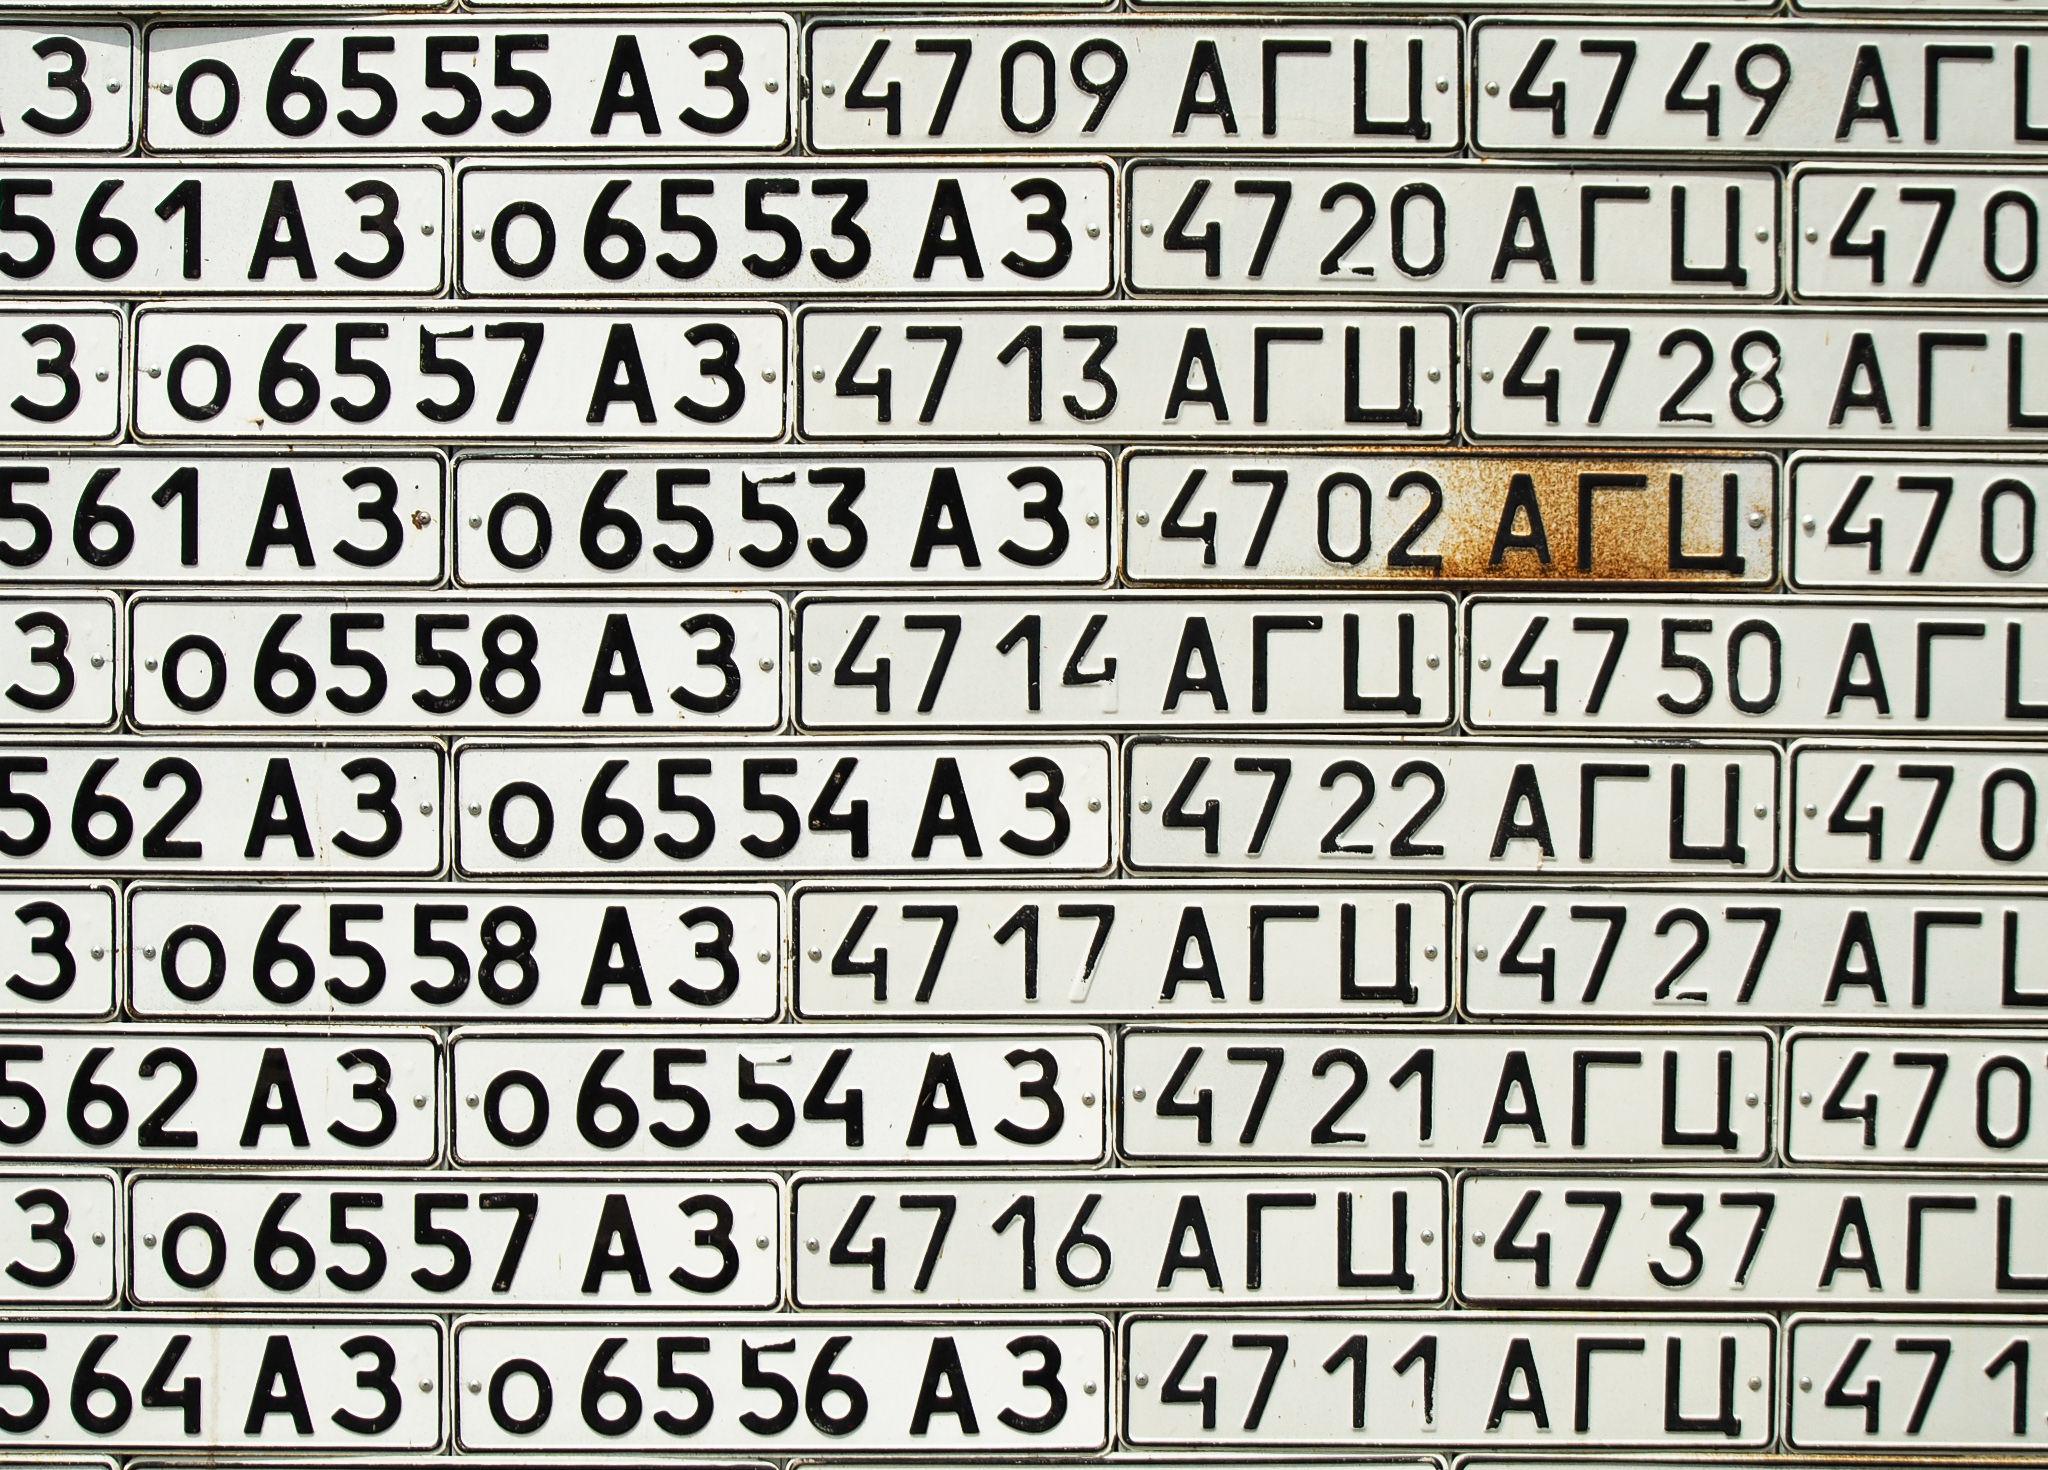 number-plate-wall-vank.jpeg